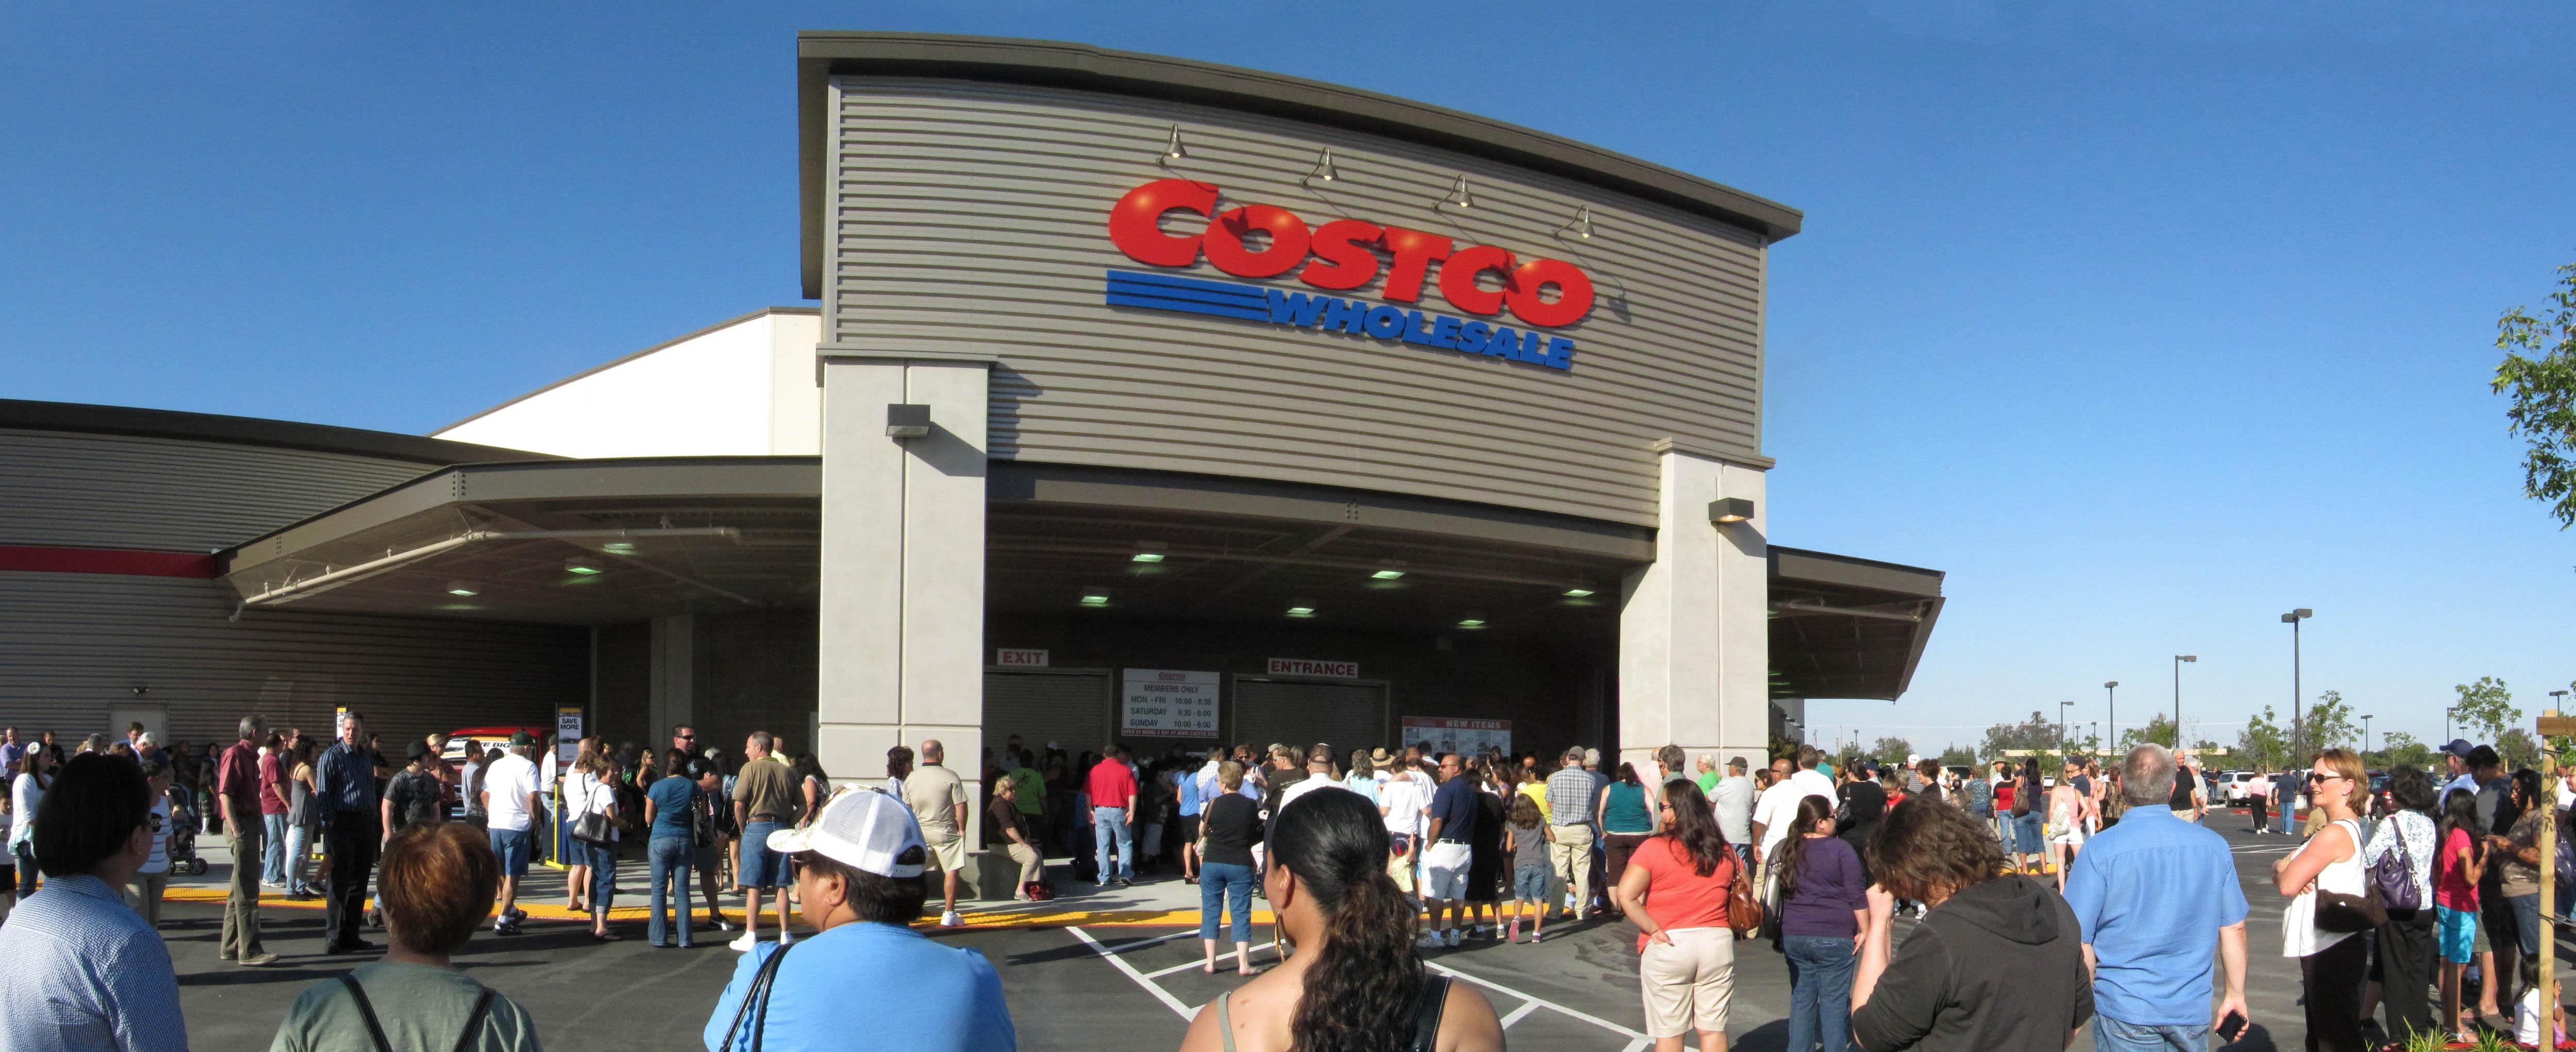 Costco-PhotoPrintPrices-Peru-Retail